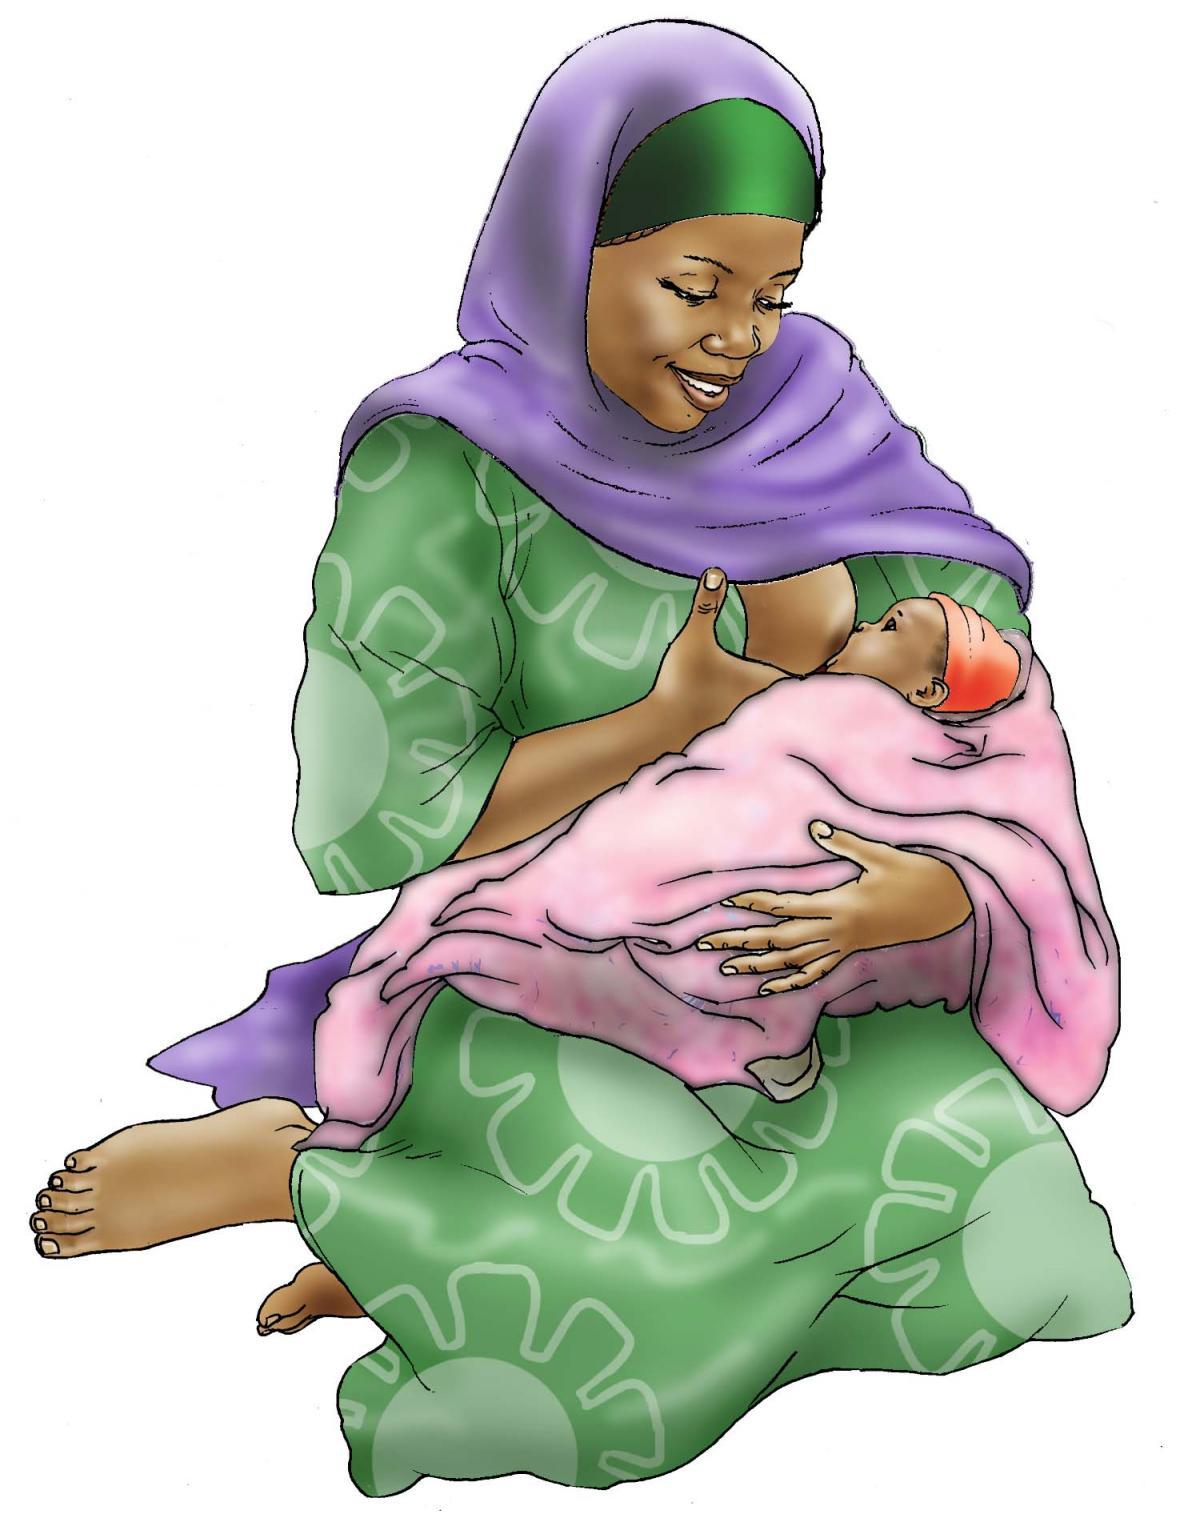 Breastfeeding - Exclusive breastfeeding 0-6 mo - 01E - Niger